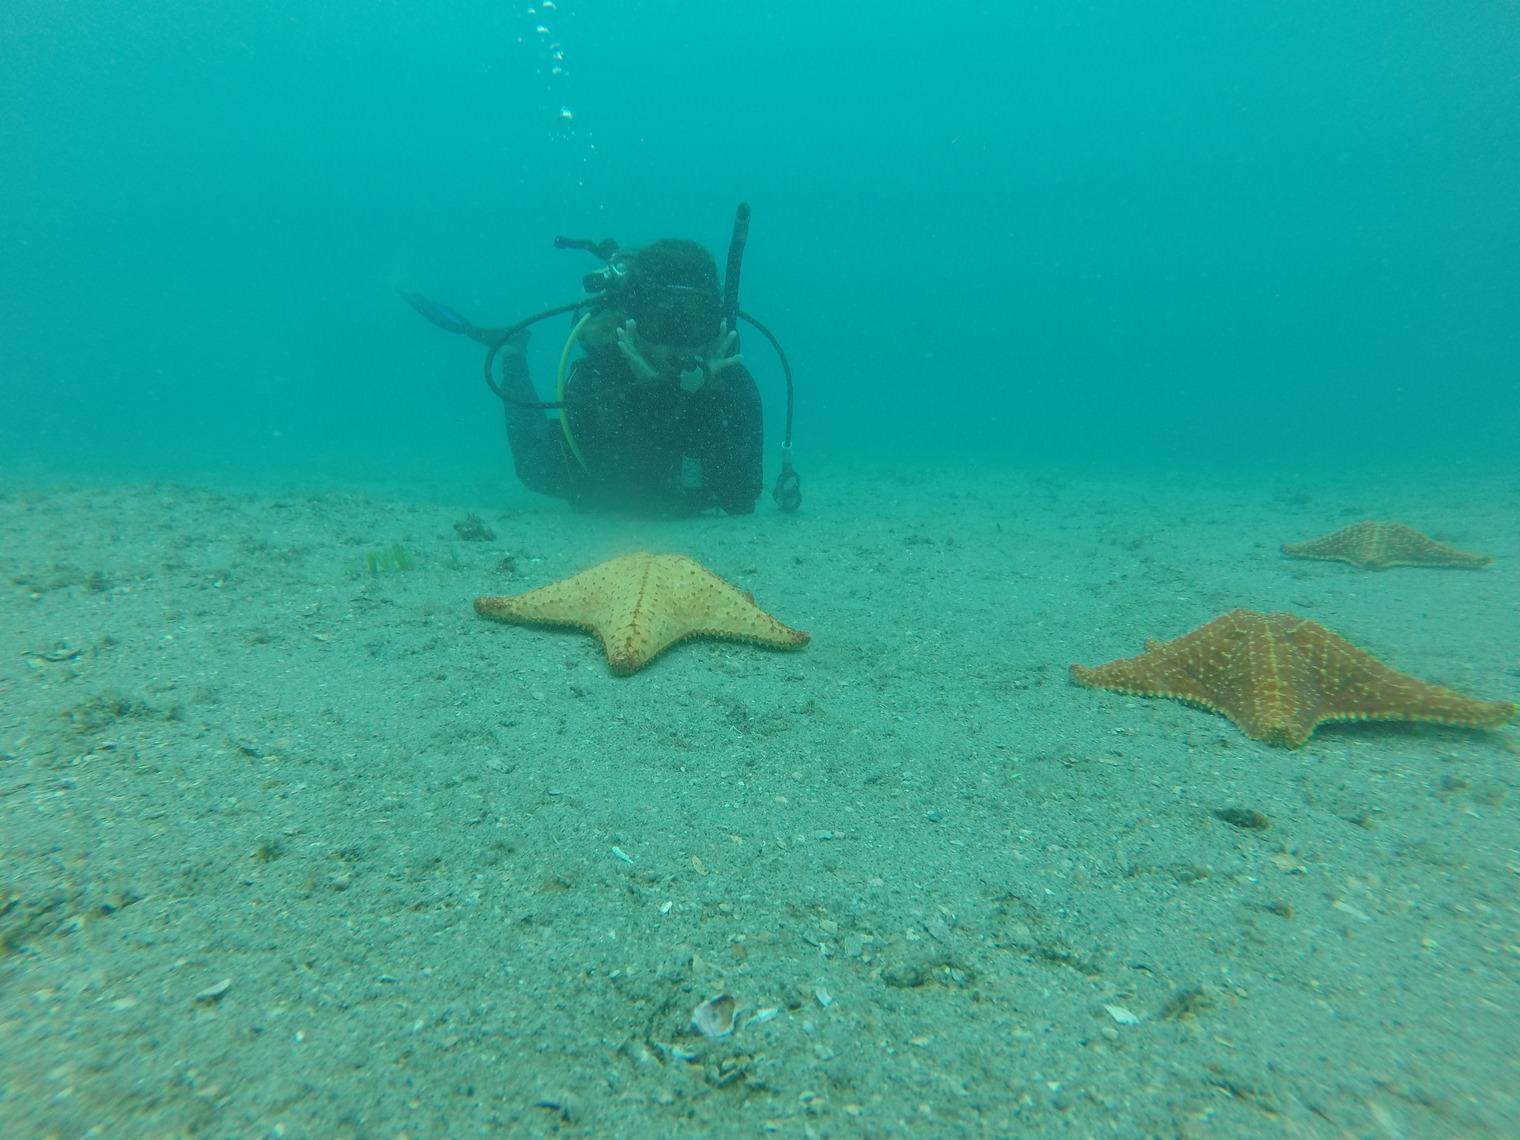 PADI Discovery Dive with Pura Vida Divers